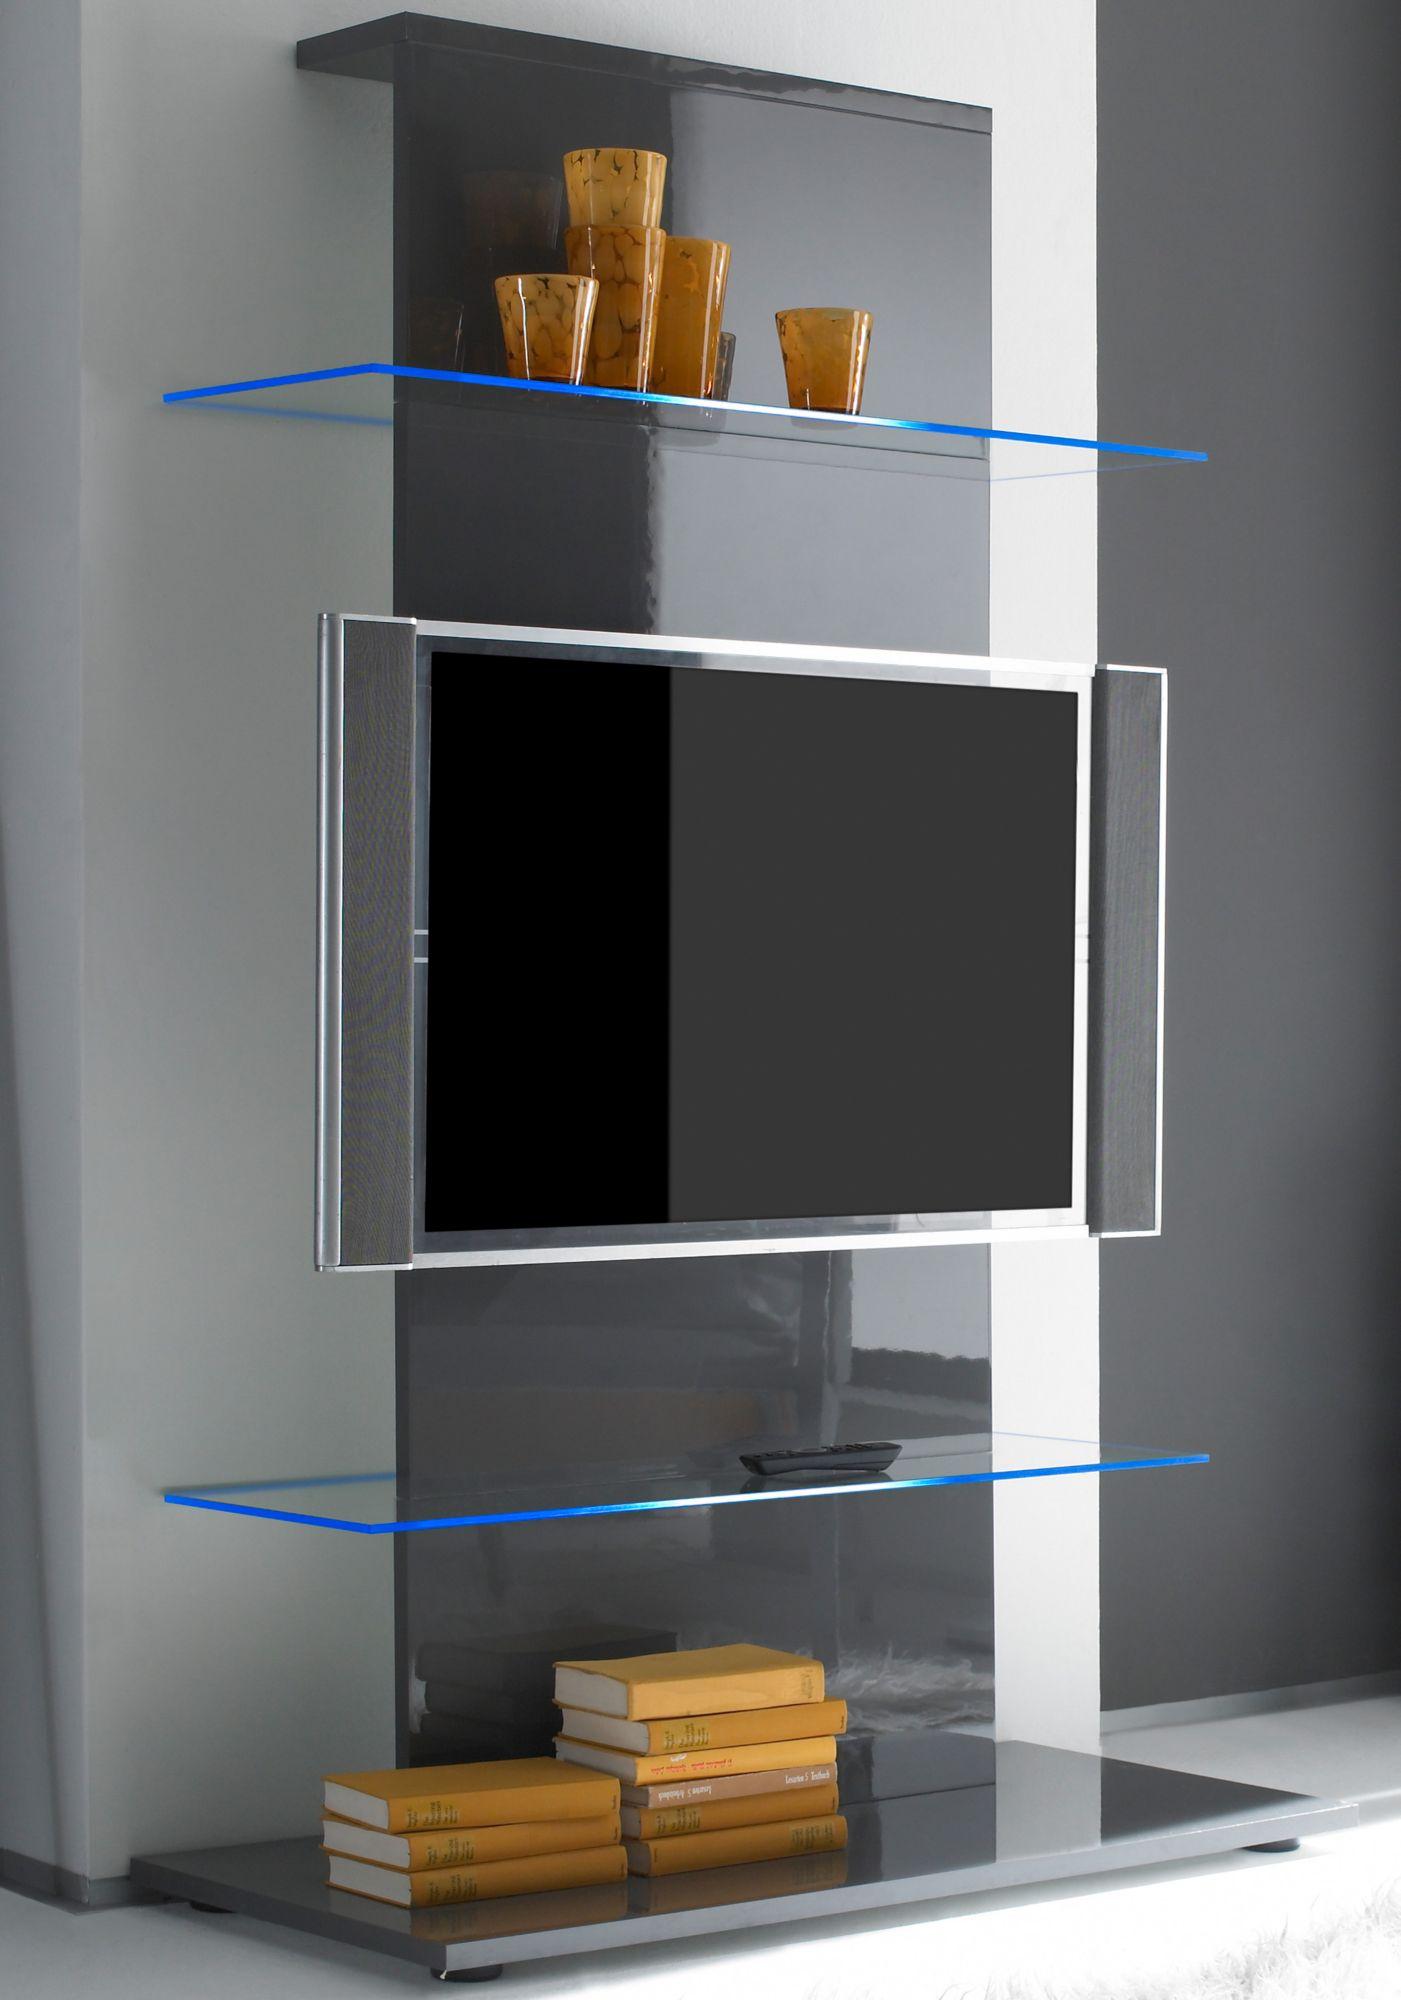 lc tv turm h he 169 cm schwab versand tv m bel. Black Bedroom Furniture Sets. Home Design Ideas